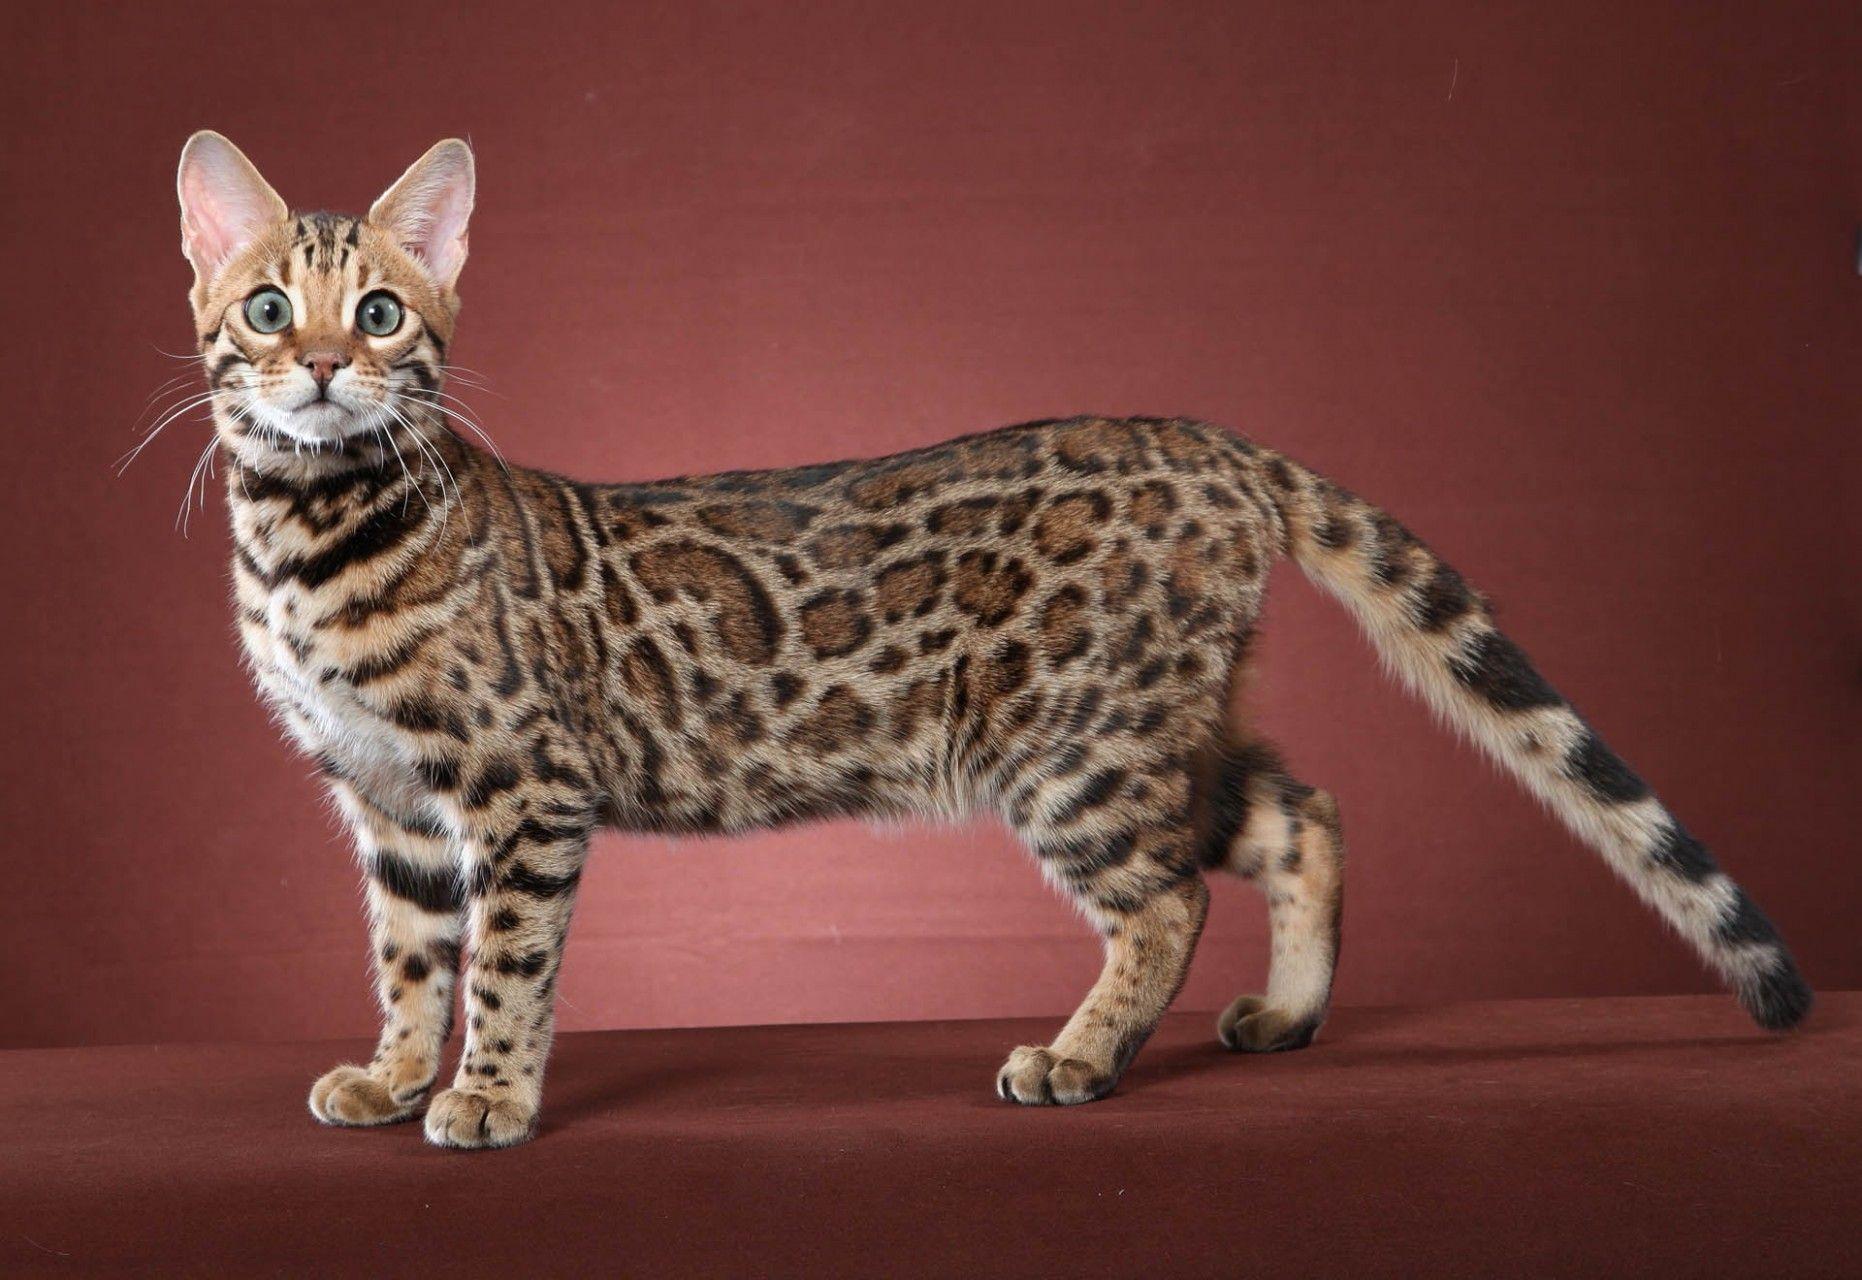 12 Best Bengal Cat Cute Cats In 2020 Bengal Kitten Bengal Cat Kittens Bengal Cat